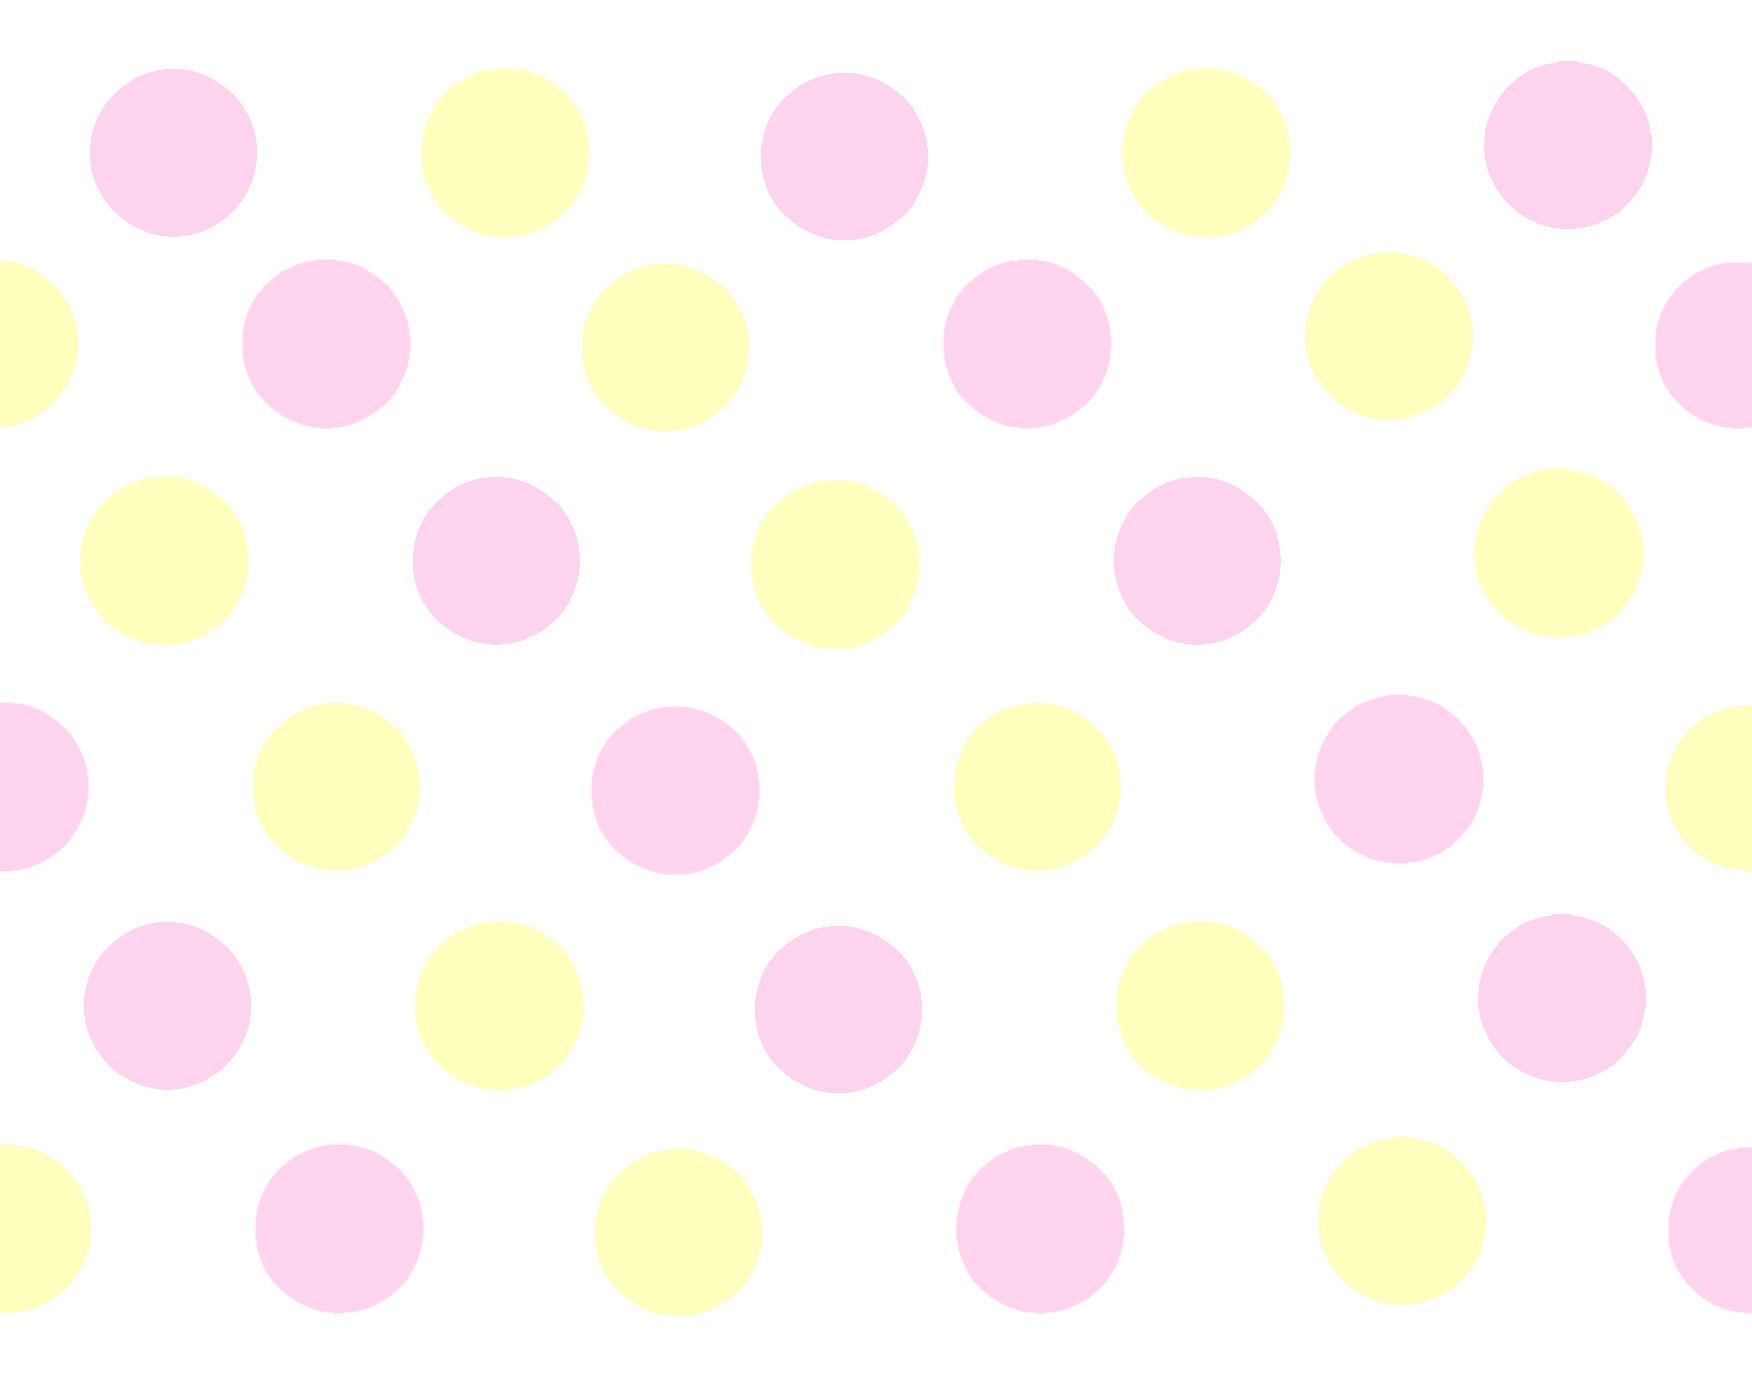 .yellow polka dot background yellow polka dot background image